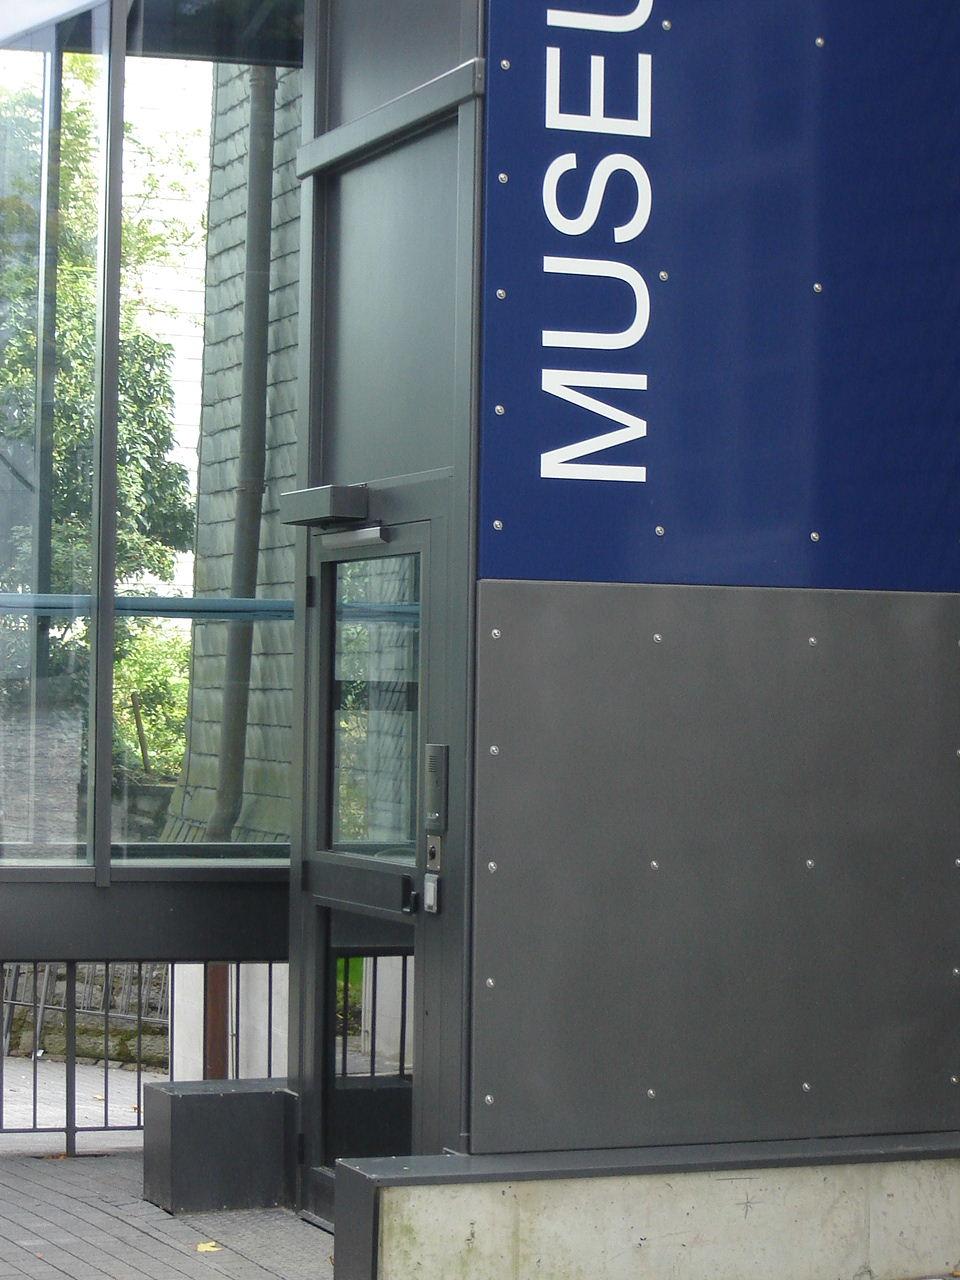 Außenaufzug Museum mit Schriftzug Museum